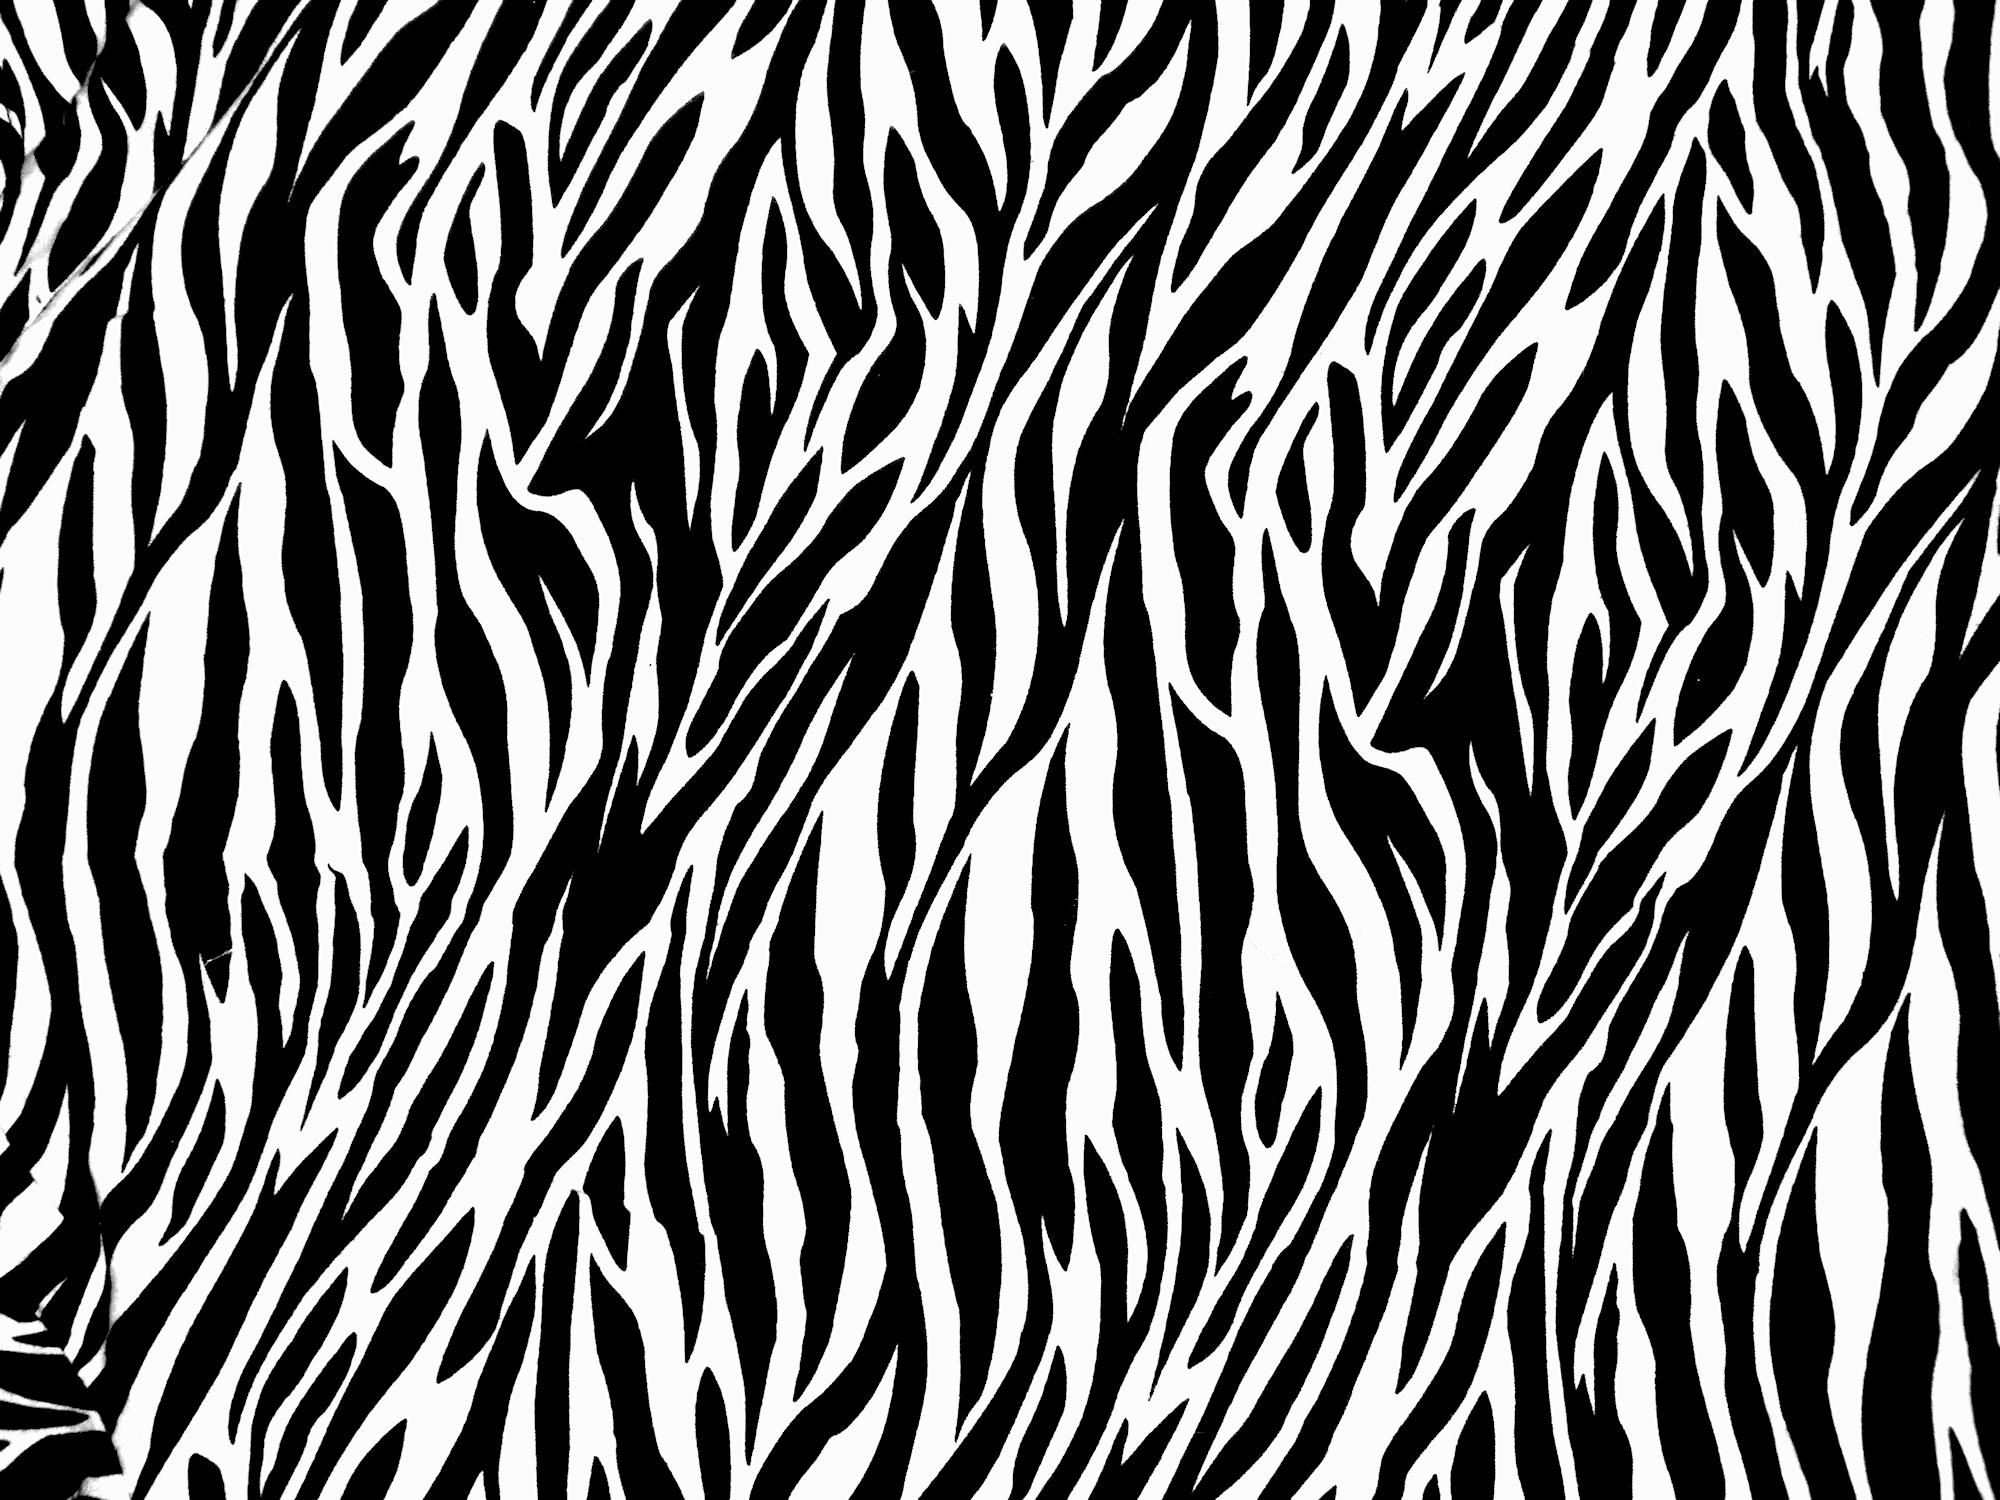 Zebra Print Pattern